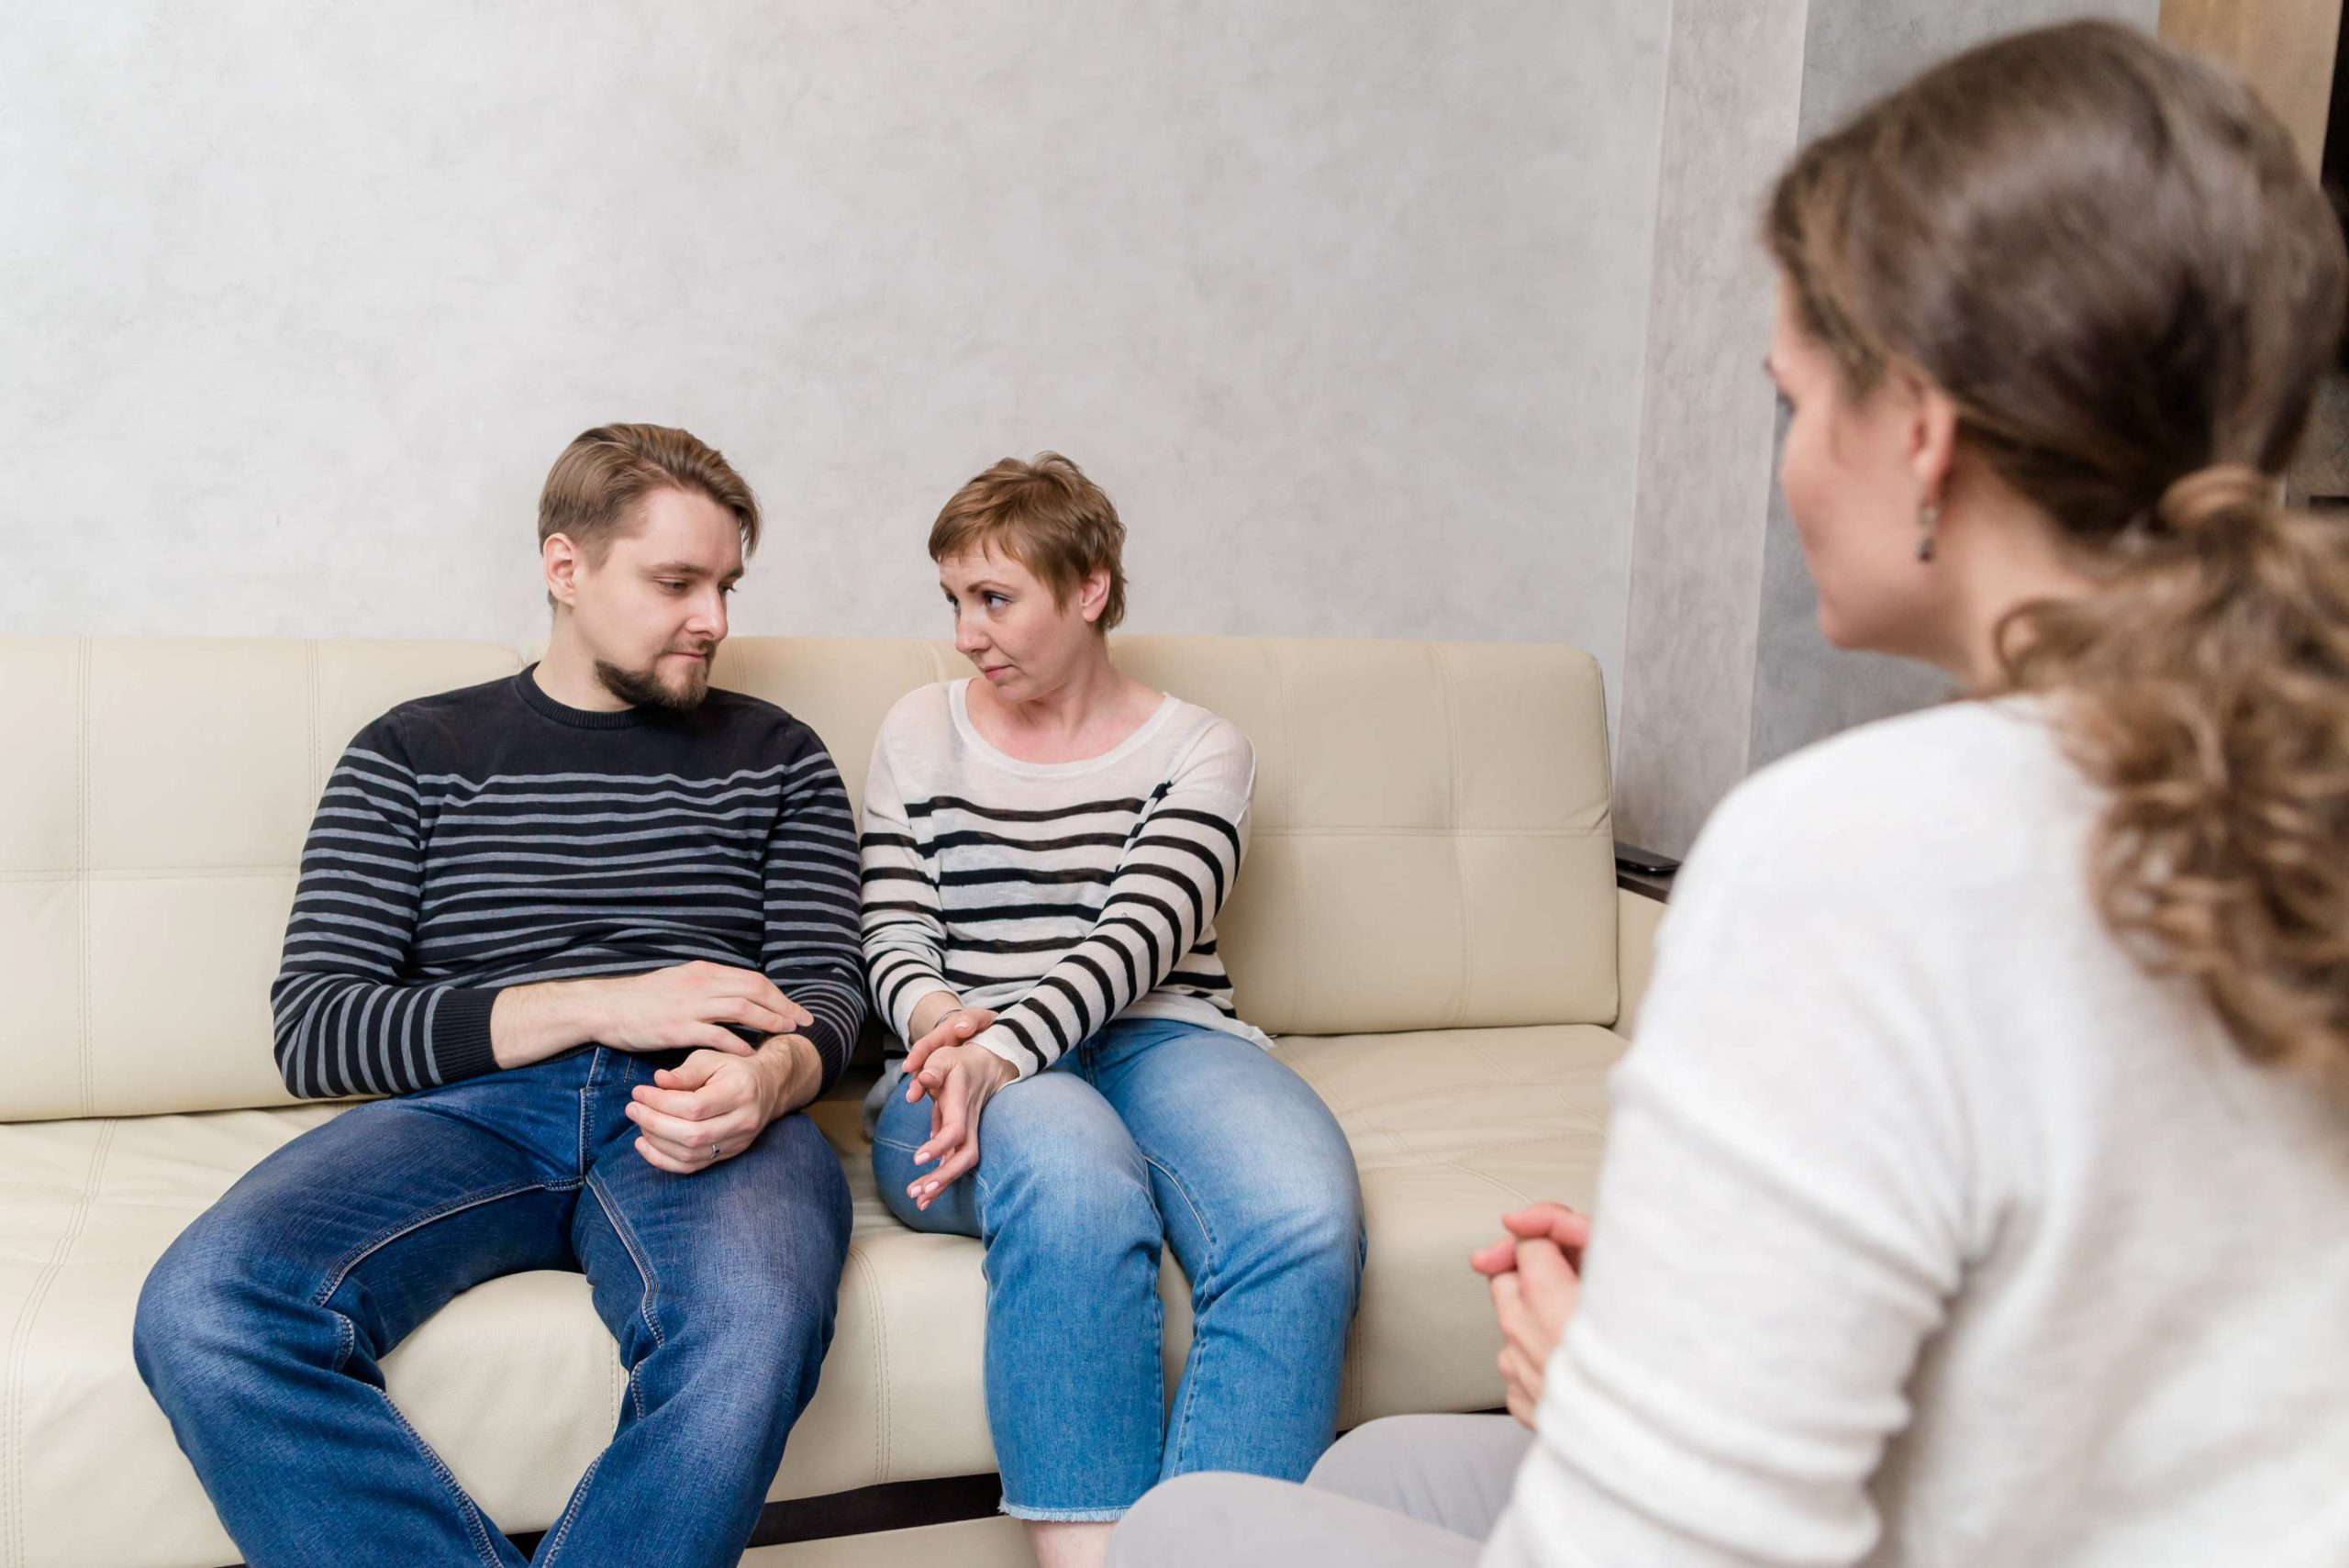 echtscheiding mediation utrecht